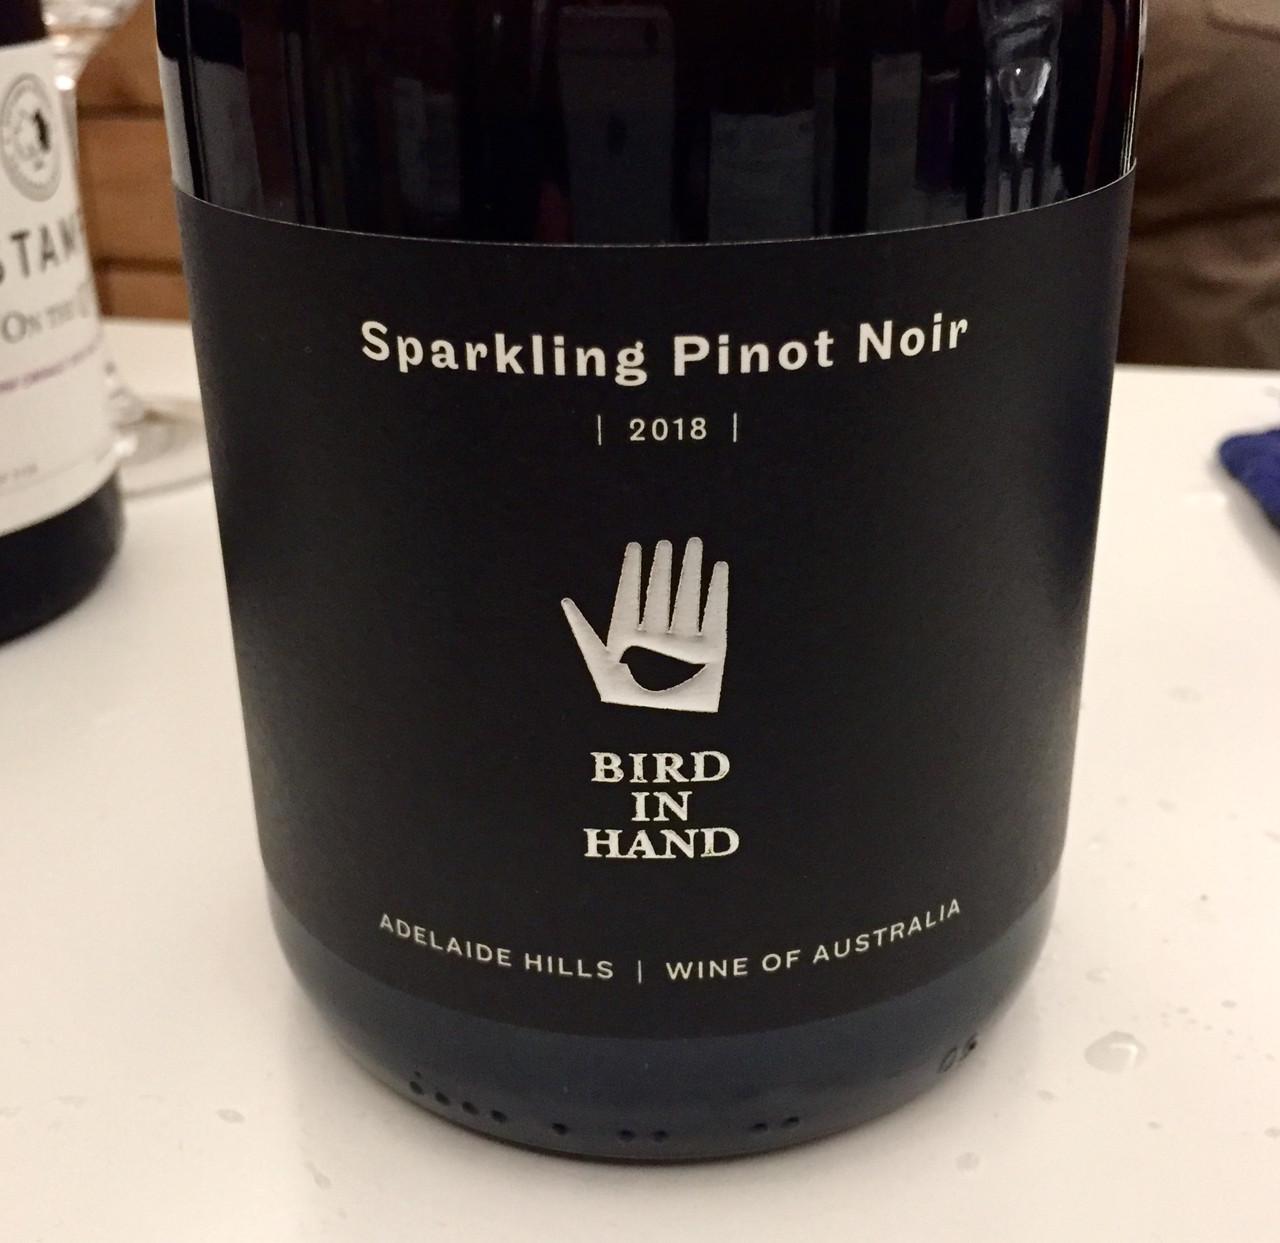 Bird in Hand Sparkling Pinot and Cava Gran Reserva